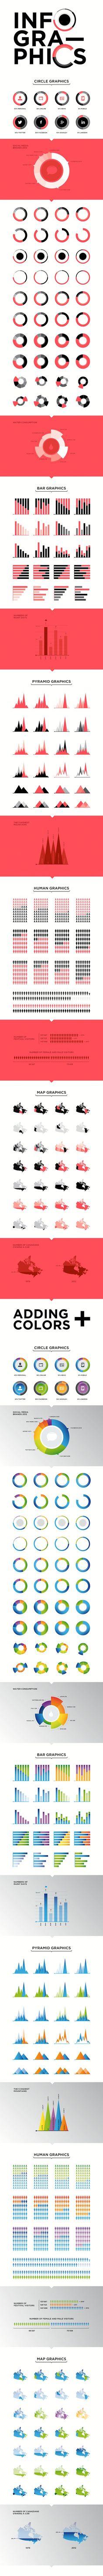 Infographics by simon spring, via Behance